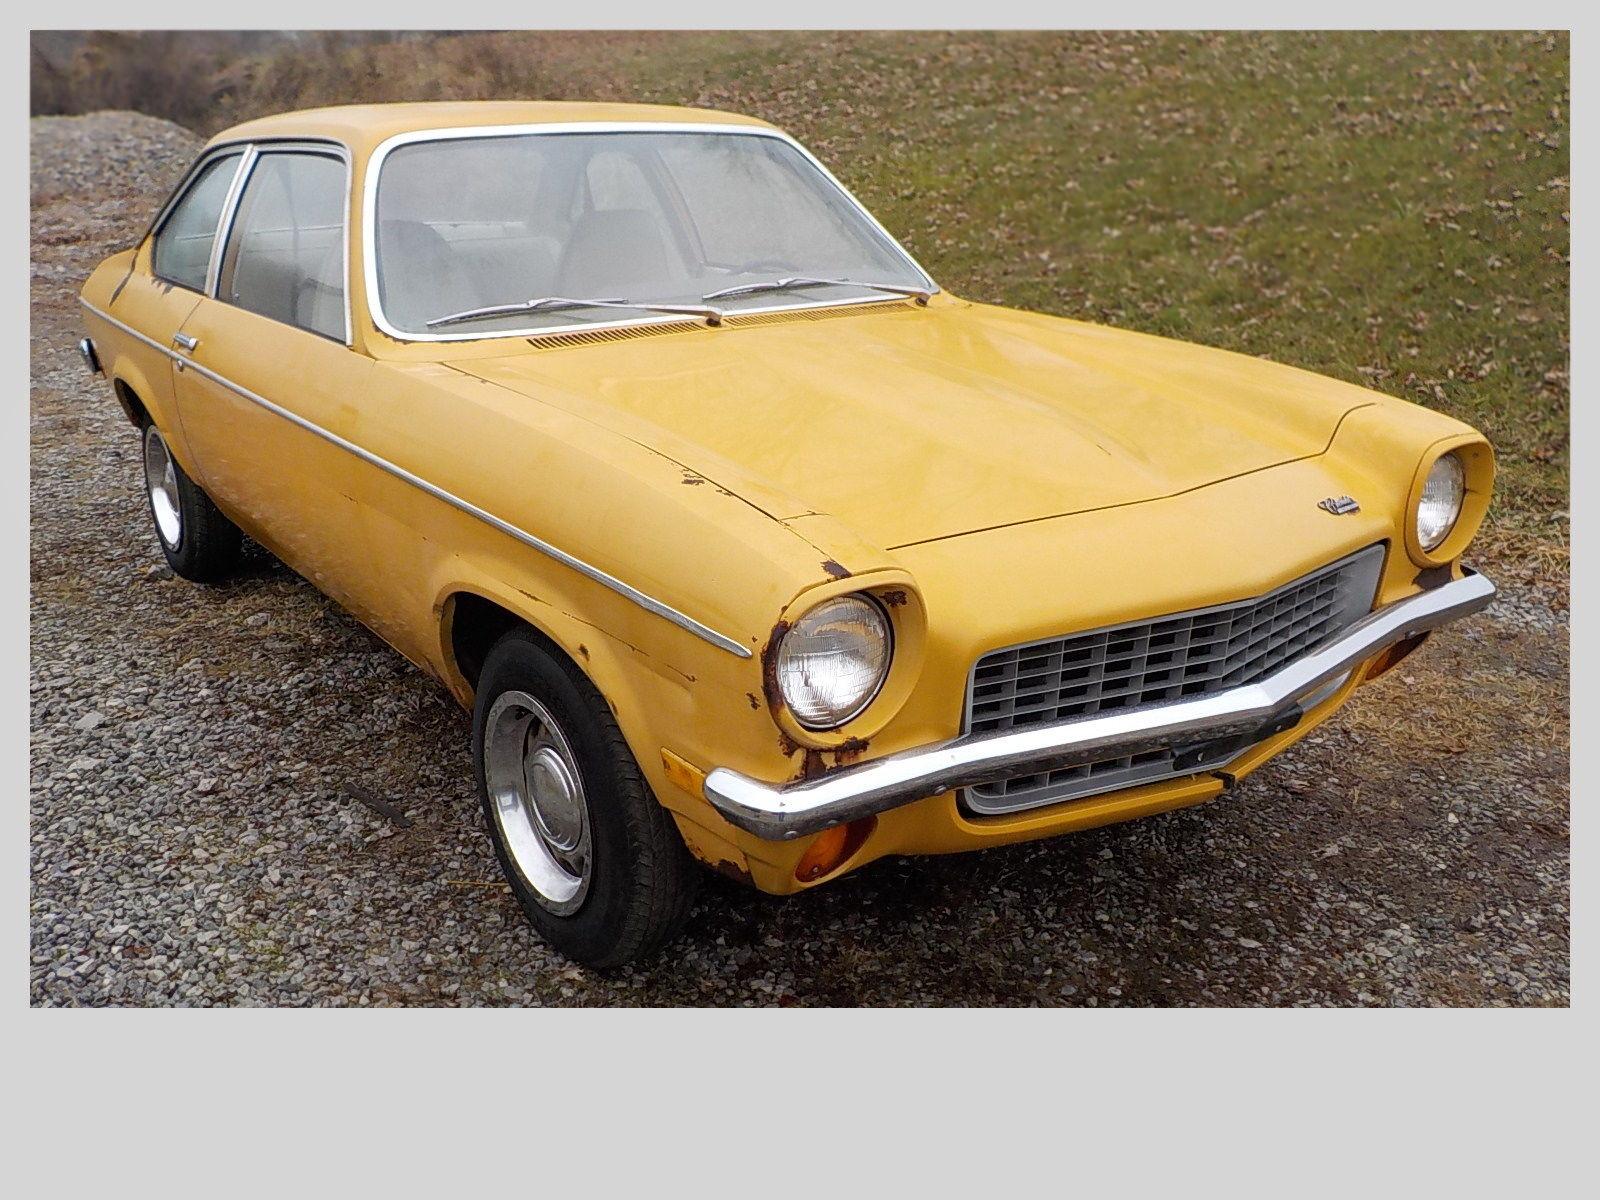 21,578 Miles: 1971 Chevrolet Vega